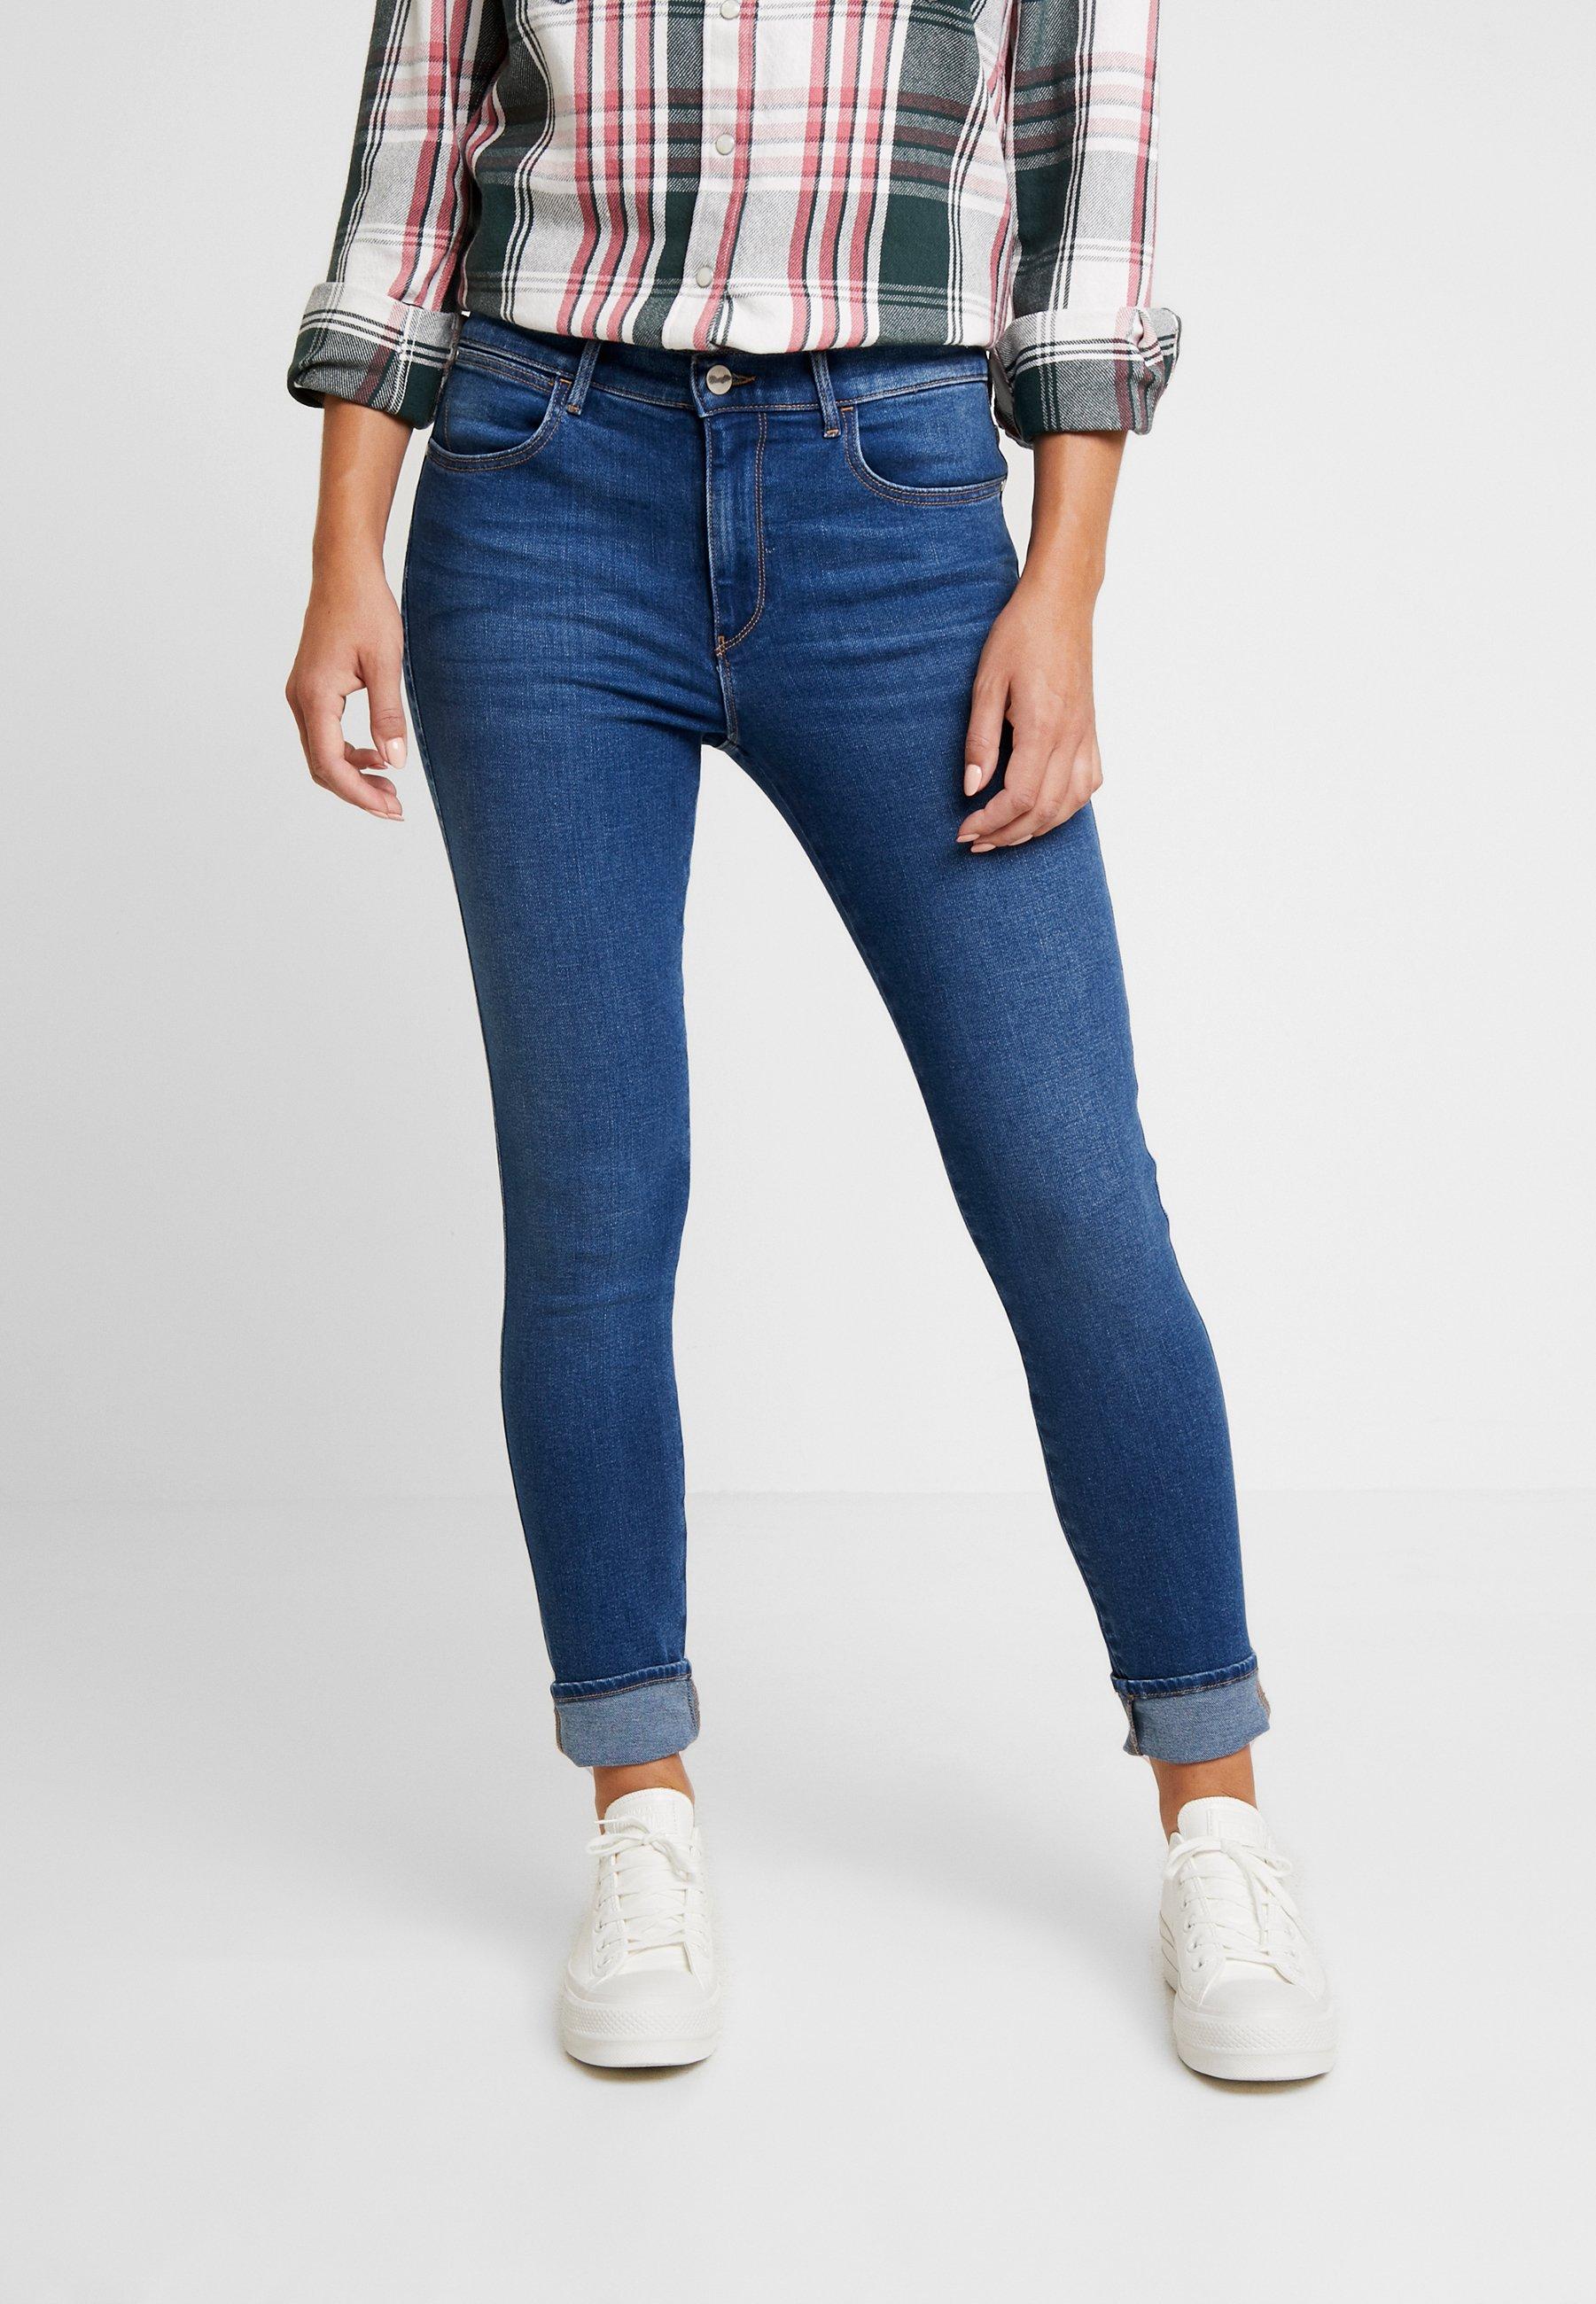 RiseJeans High Indigo Wrangler Mid Skinny qSMpzUV